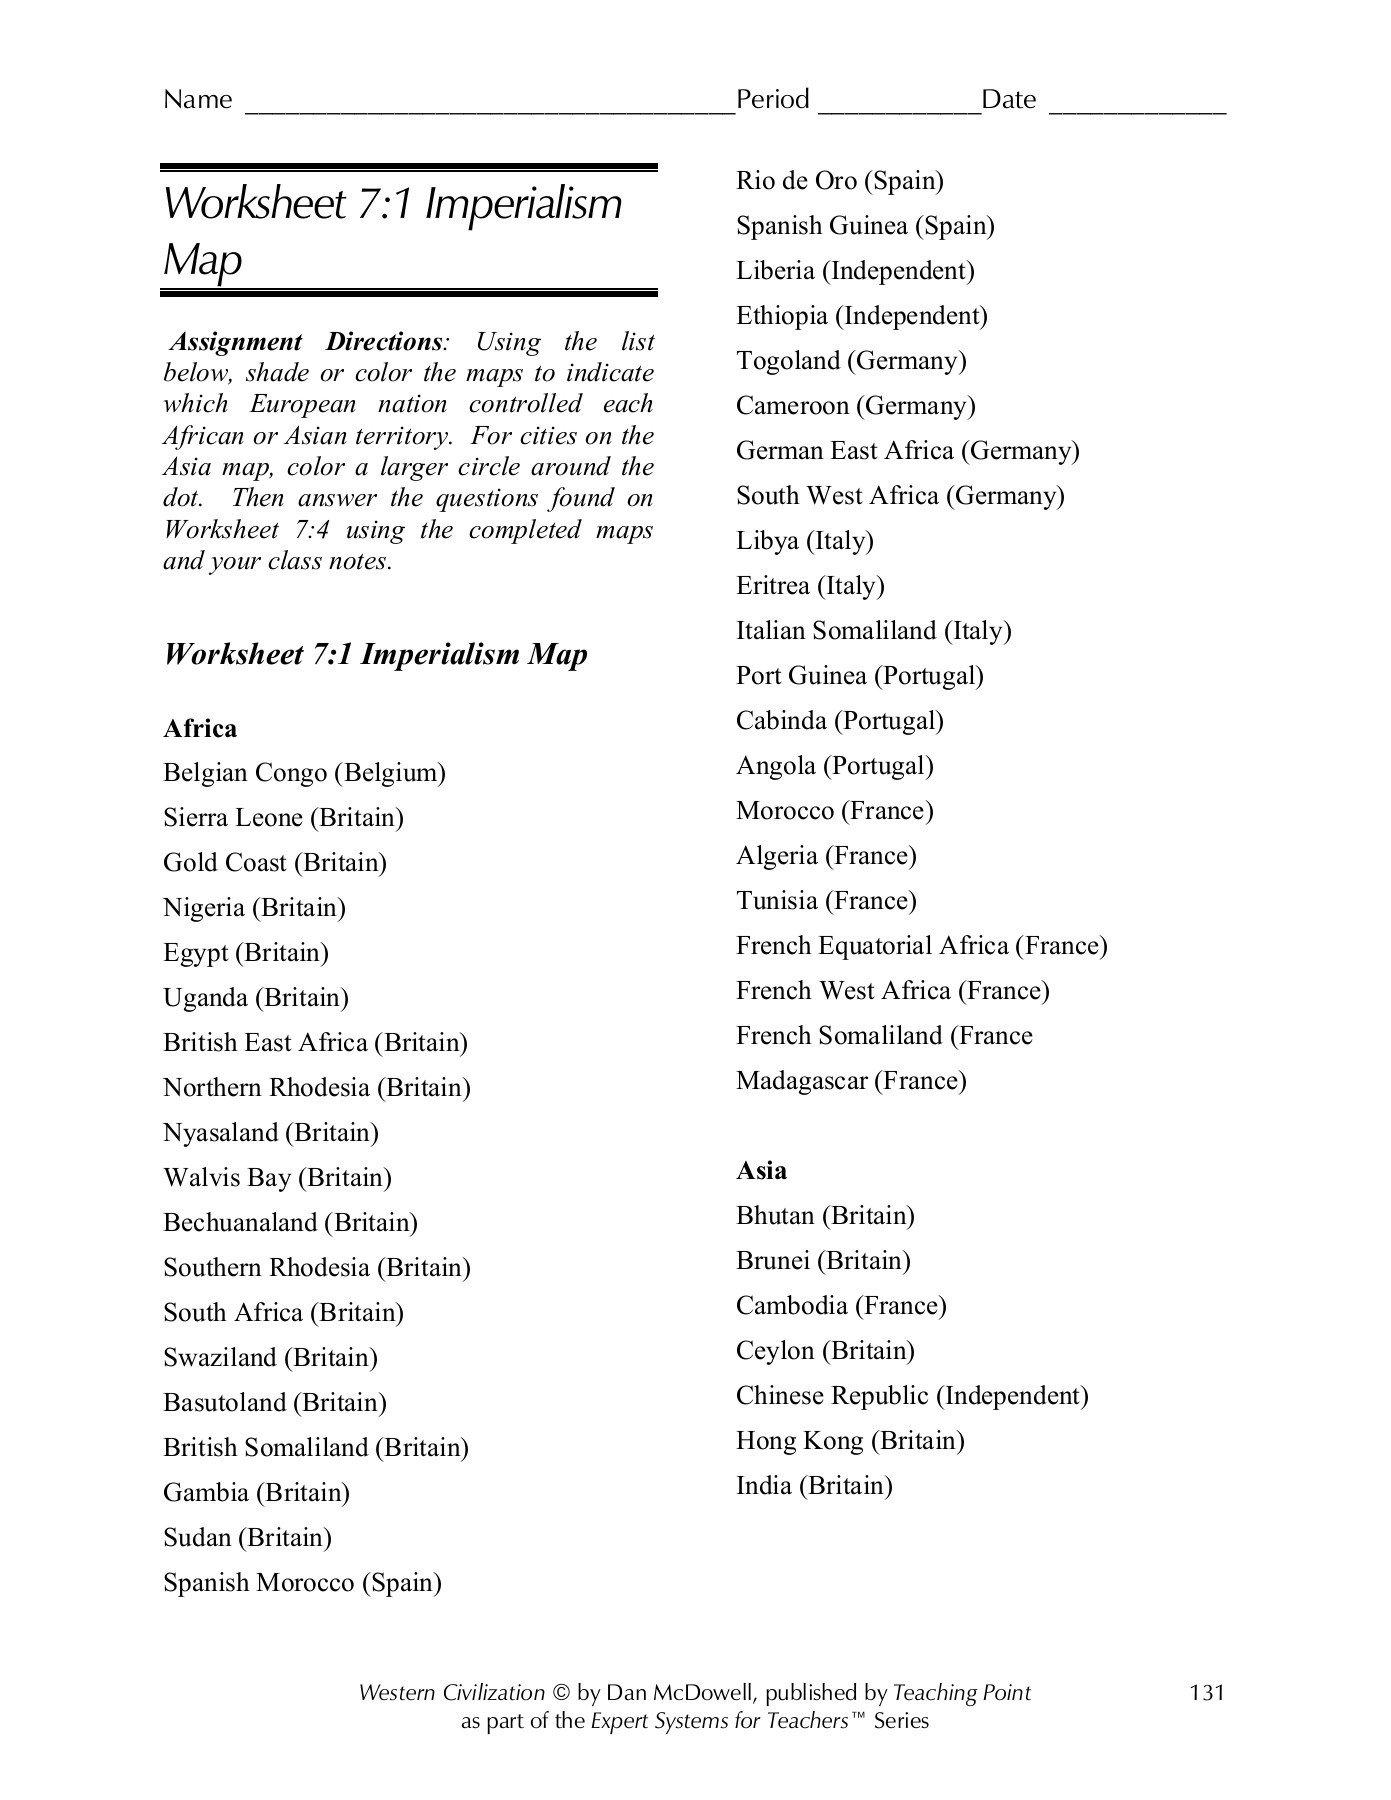 Worksheet 71 Imperialism Map  Wohs Portal  Home Page Pages 1  7 And Worksheet 7 4 Imperialism Map Questions Answers